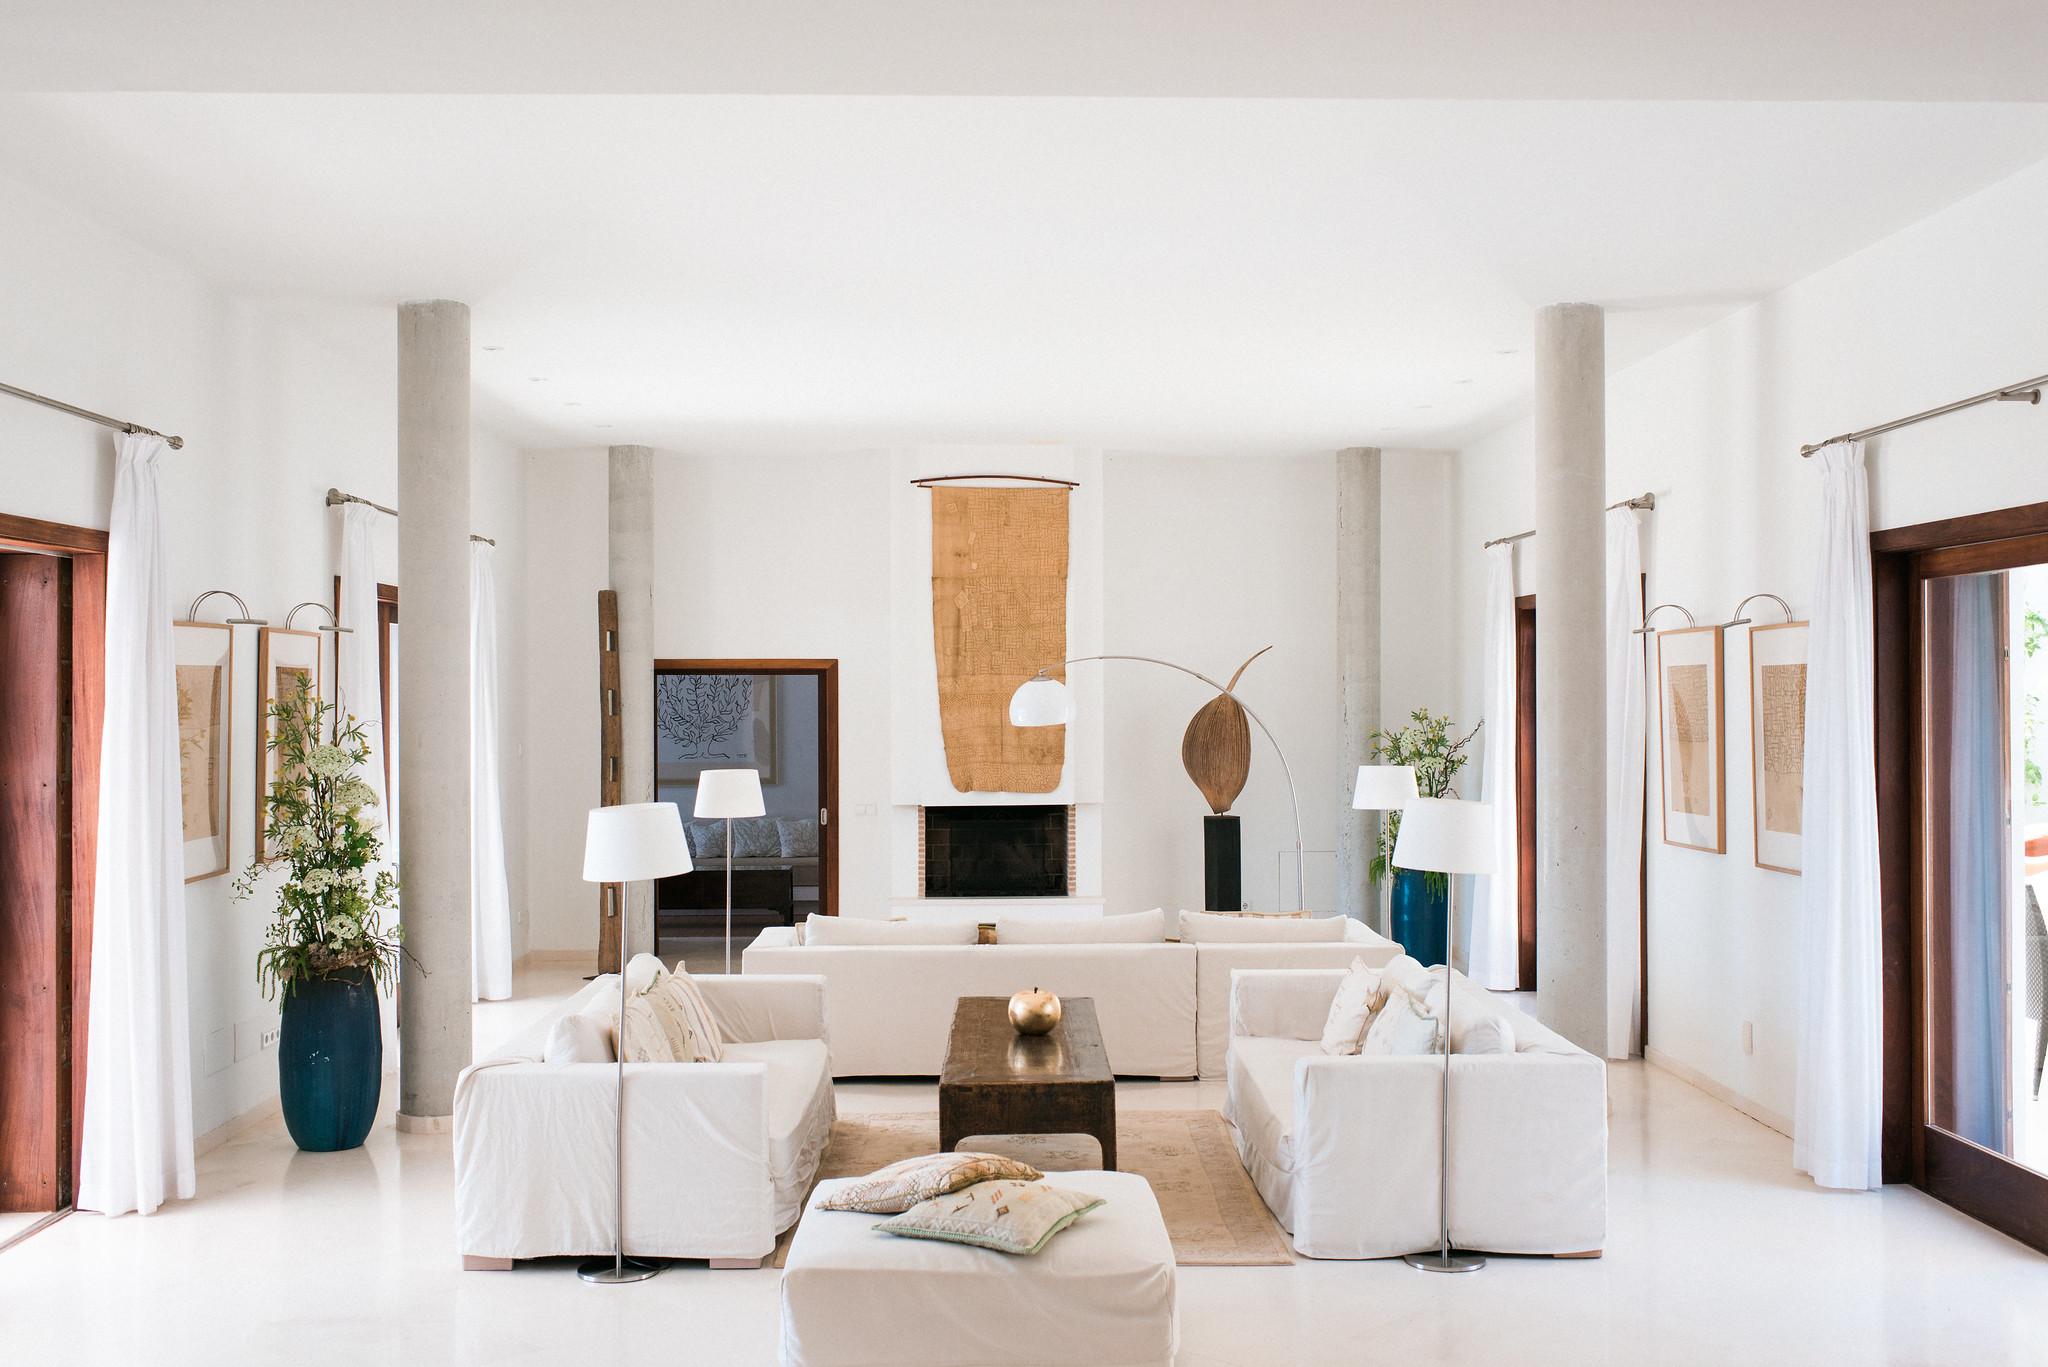 https://www.white-ibiza.com/wp-content/uploads/2020/05/white-ibiza-villas-can-ava-1.jpg